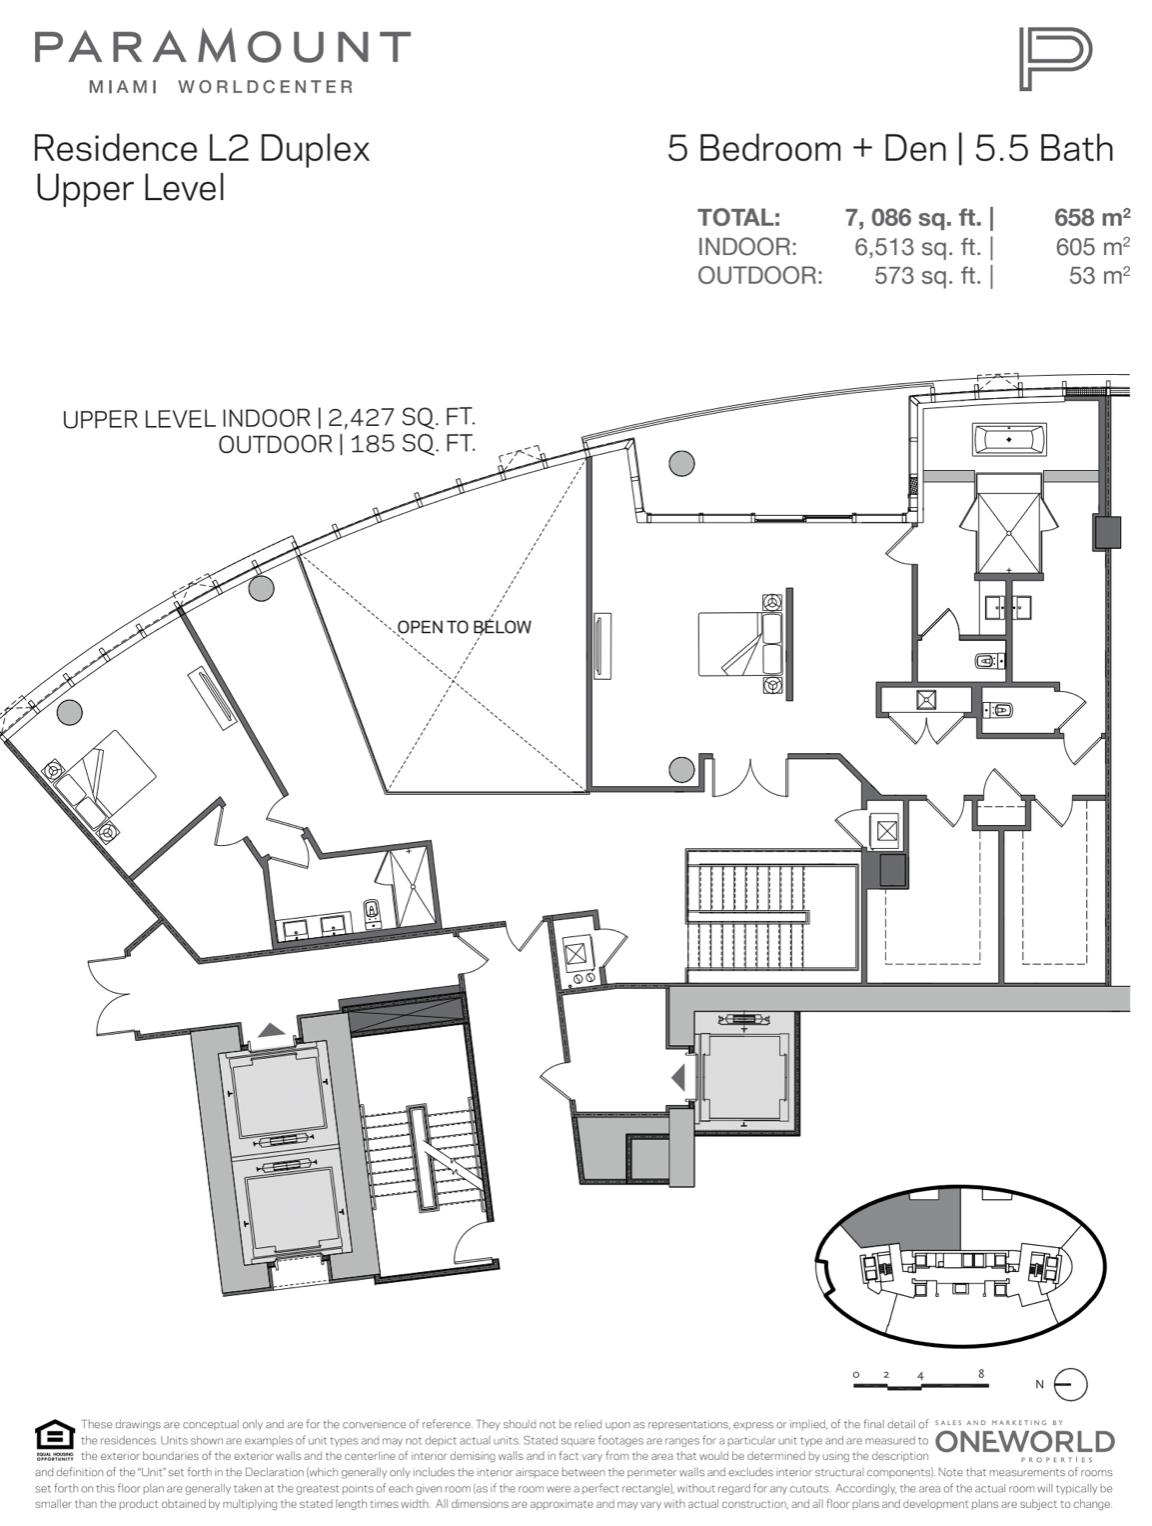 PMWC Penthouse L2 Upper Level